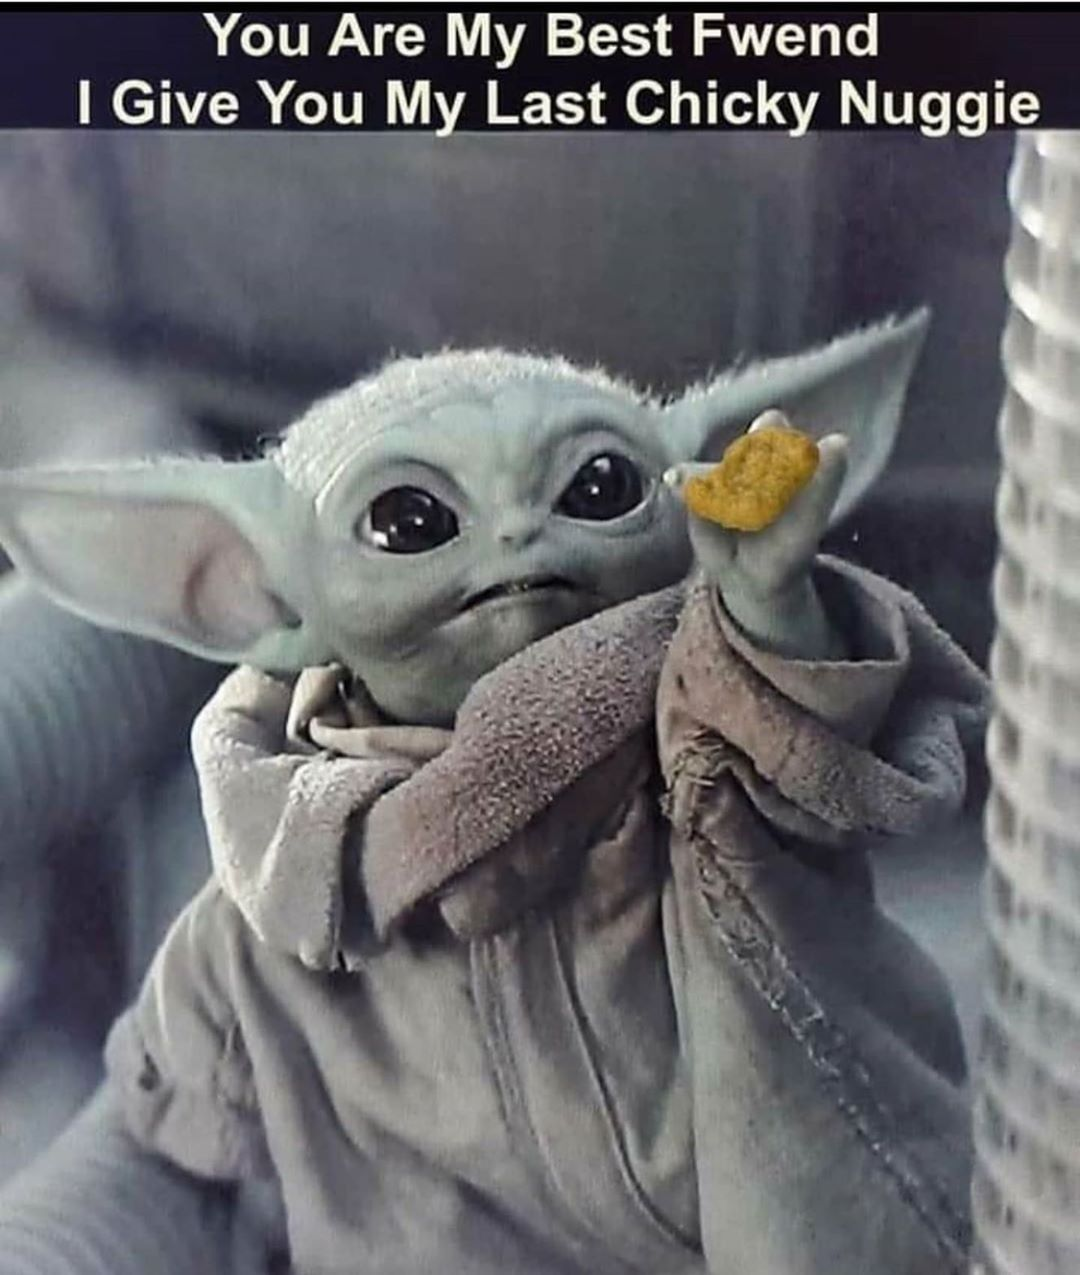 Meme S Quotes Memes Its Memes Laughing Memes Memes Quotes Funnie Memes I Meme Truthful Memes Happy Meme What Memes E Yoda Funny Happy Memes Yoda Meme